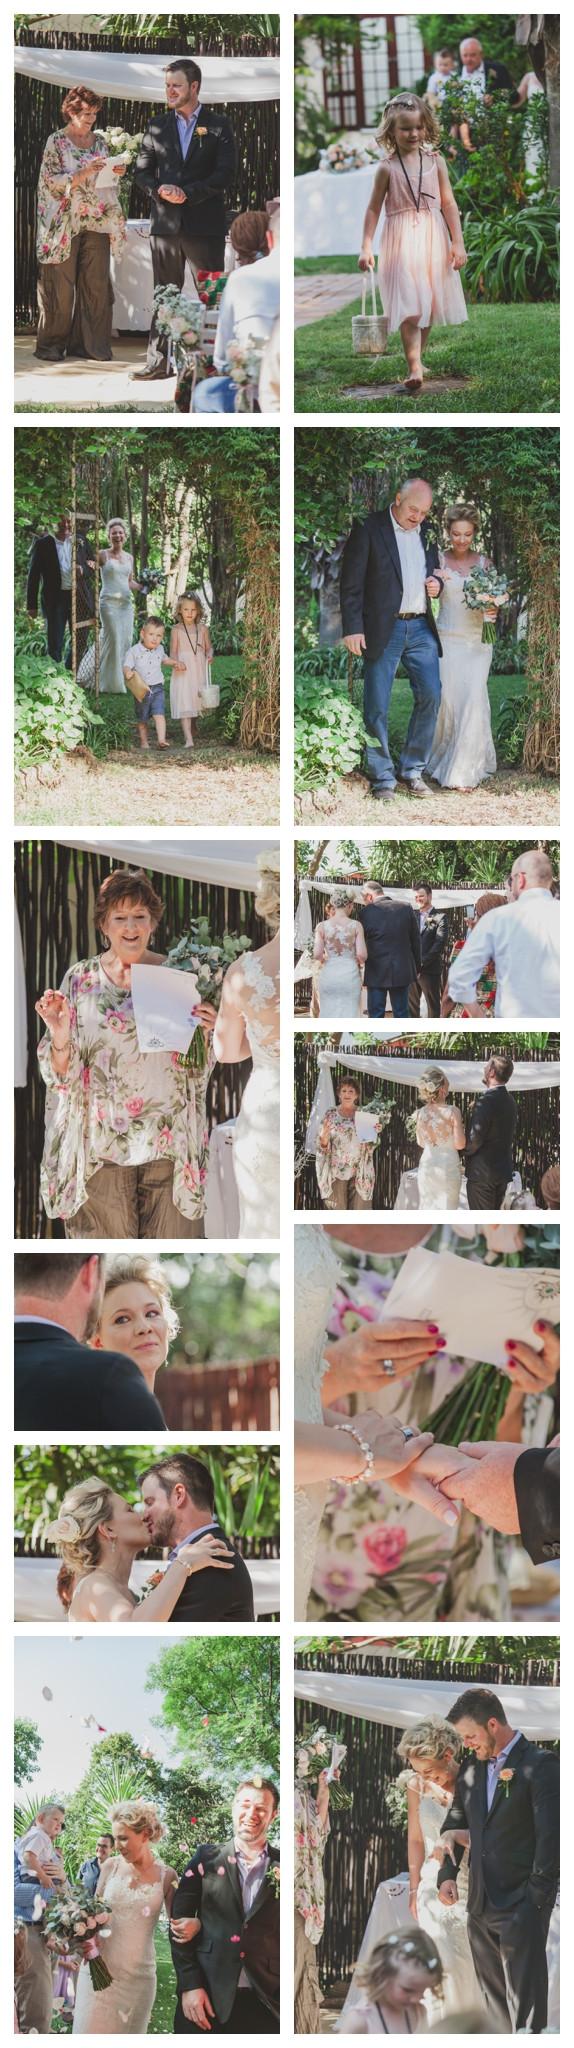 Craig and Nadine's garden wedding ceremony